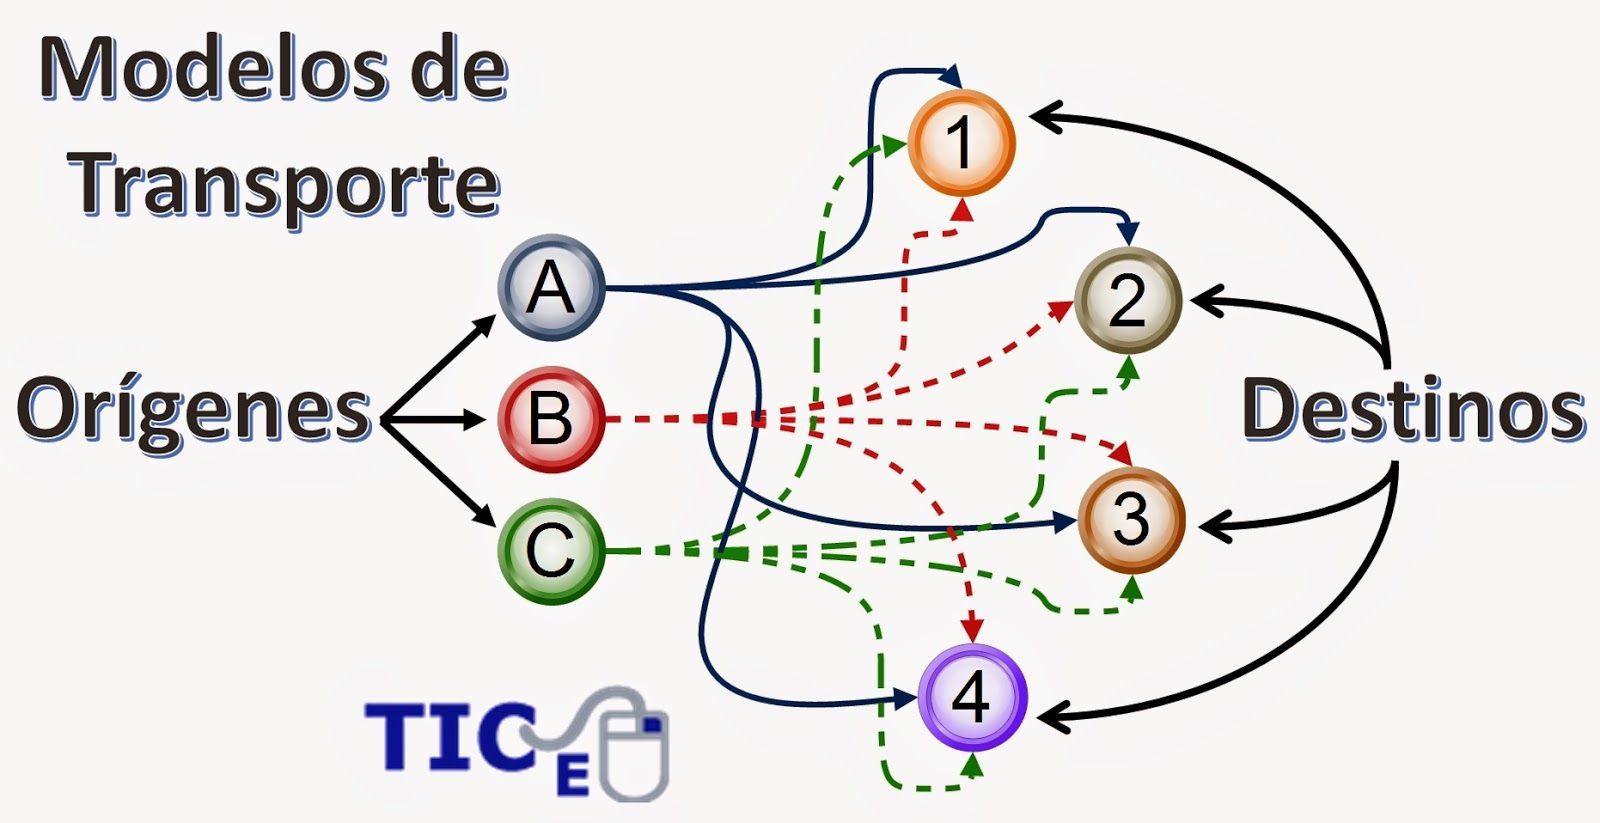 minitab pareto diagram solar power controller circuit linear programming examples transportation models 10